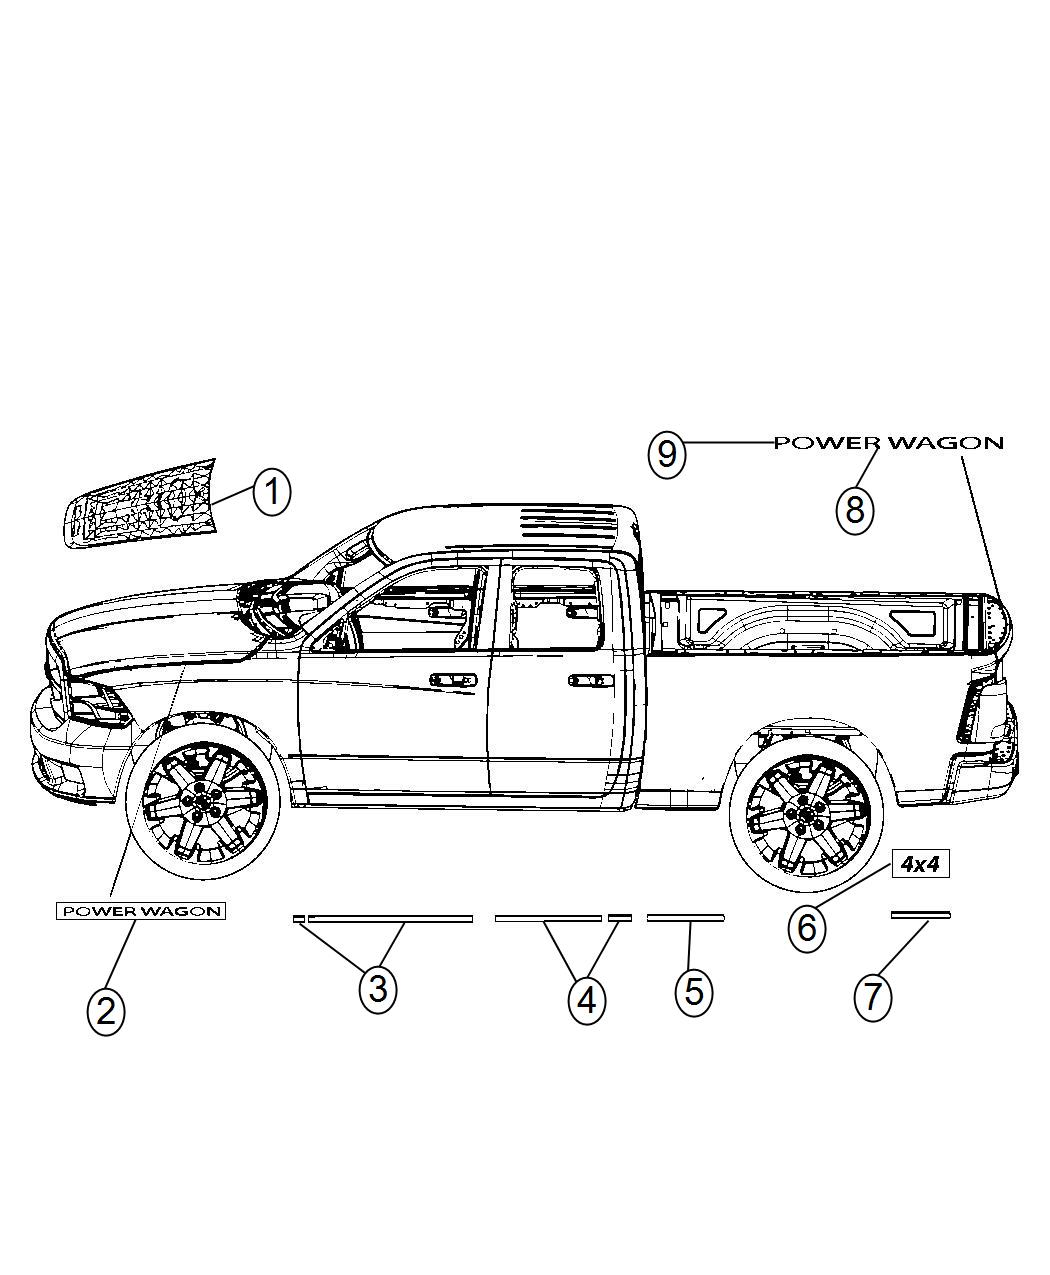 05182408aa - mopar decal  hood  power wagon   powerwagon decal